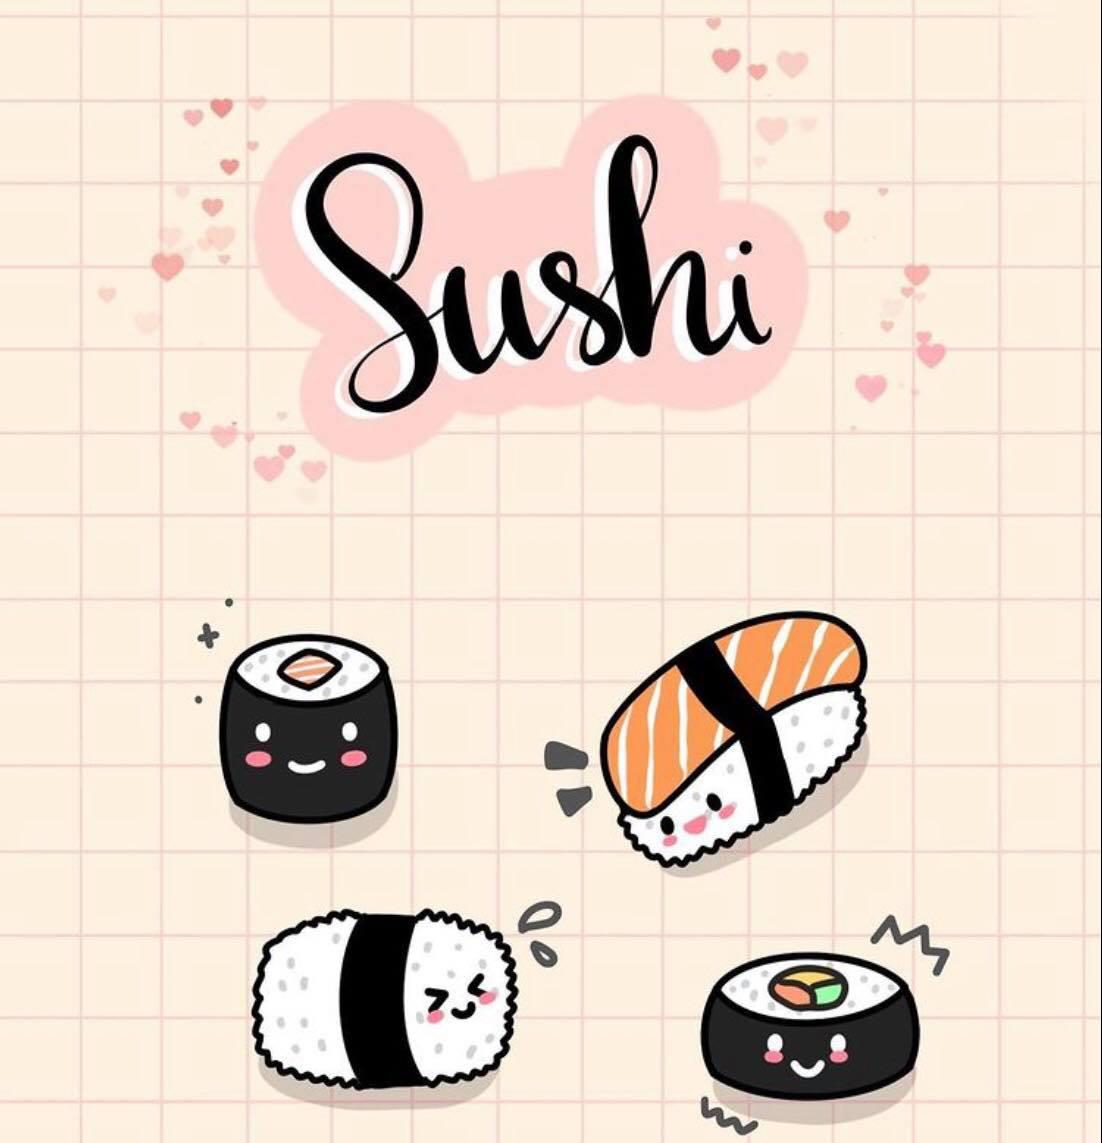 I will create cute illustration for sticker